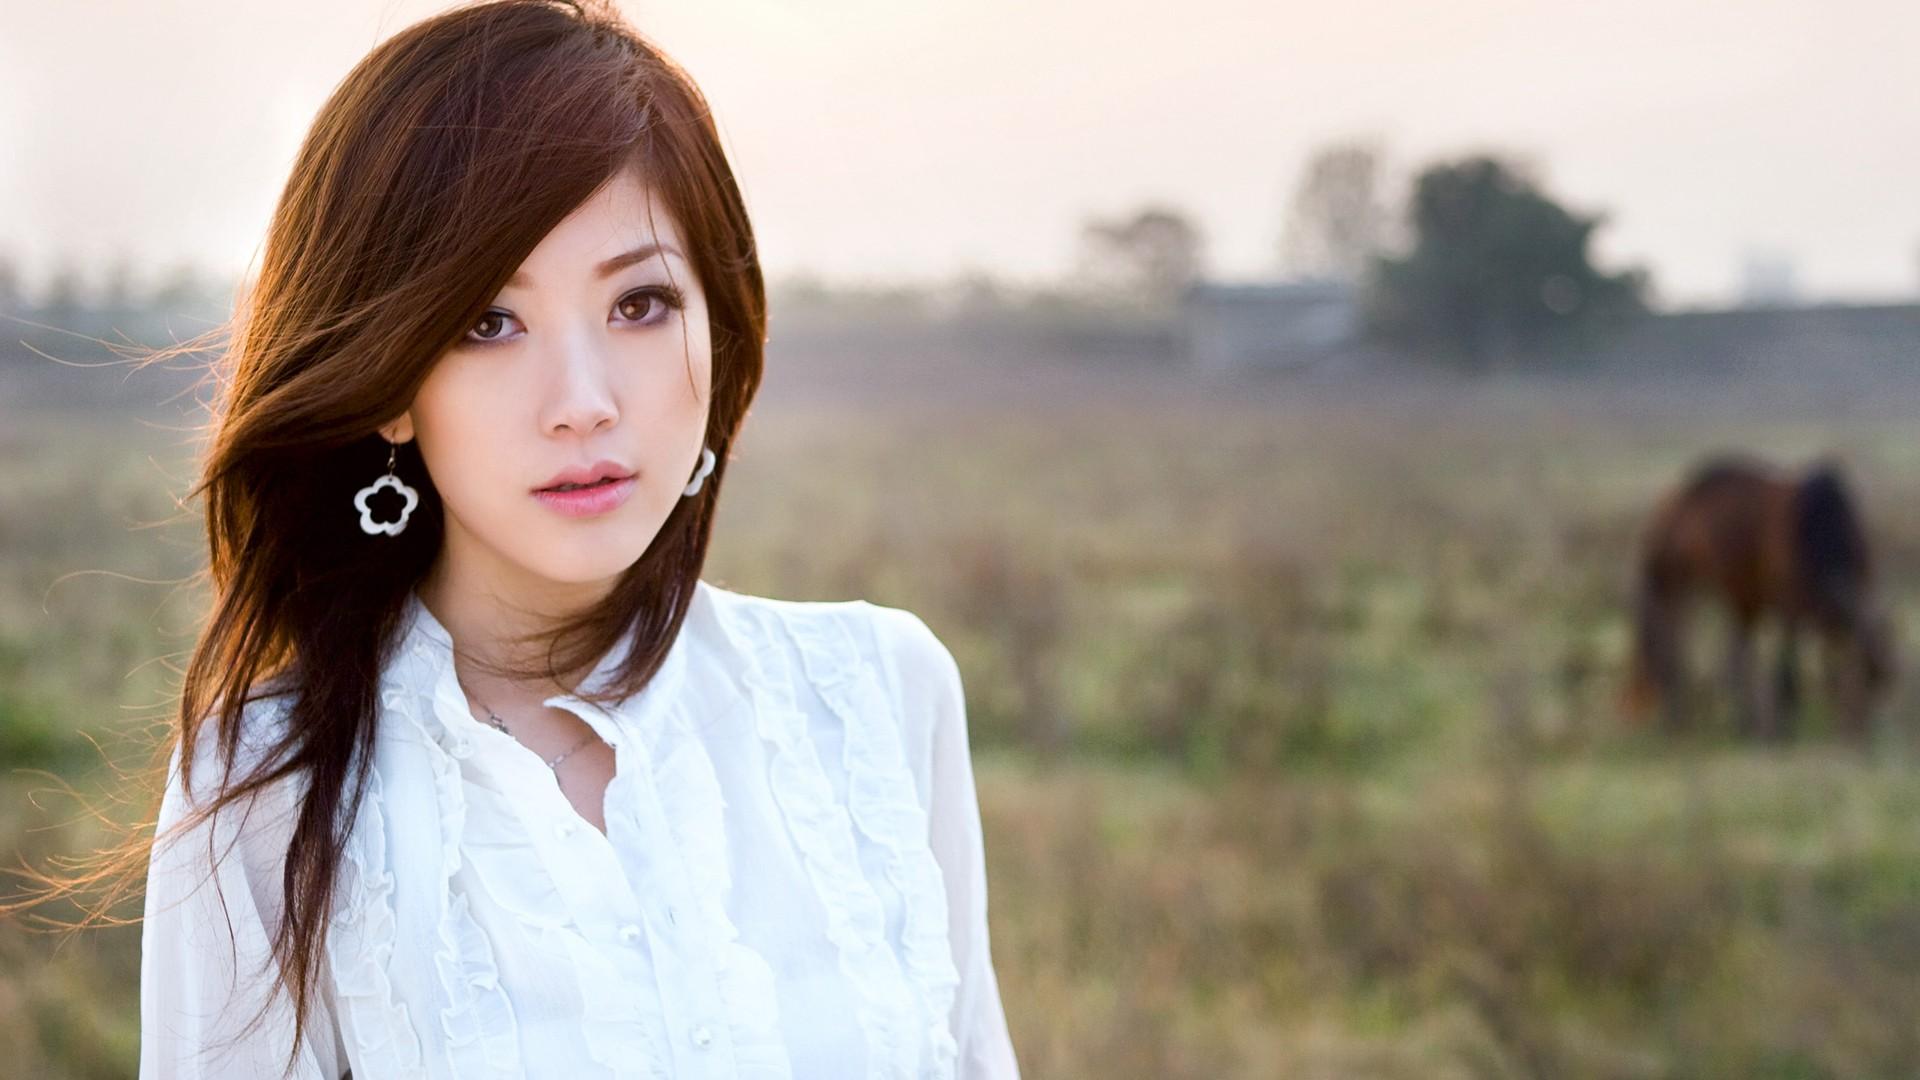 Random japanese girl names, minka big boobs free videos